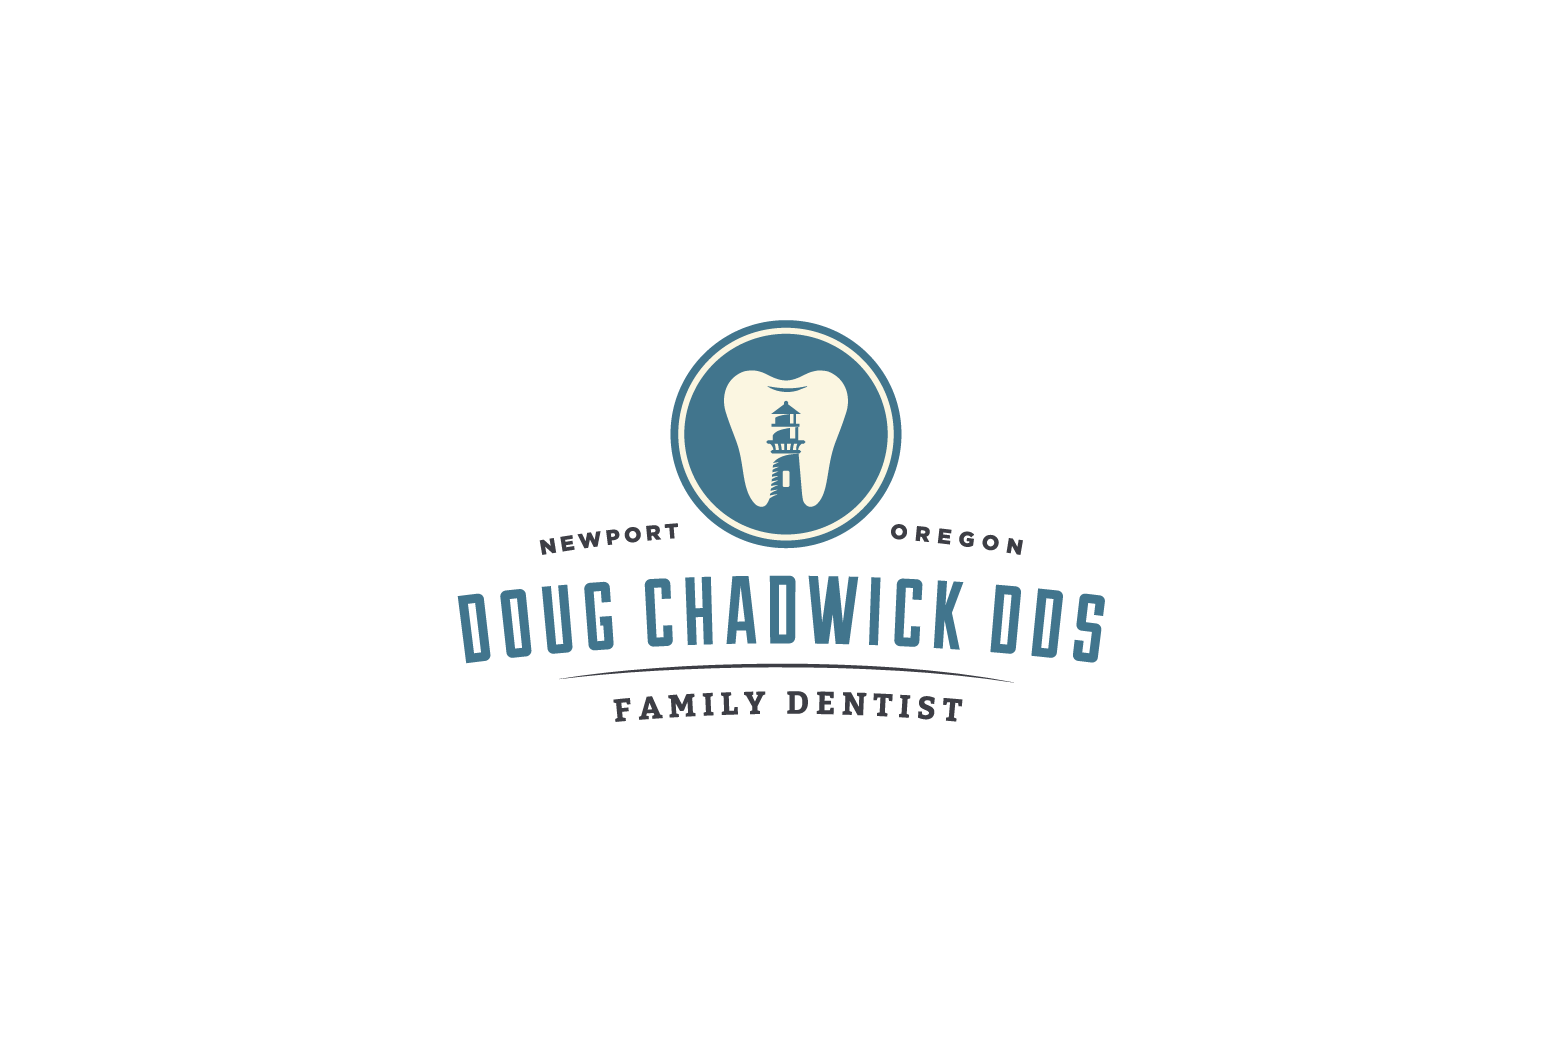 Doug Chadwick Dentist Logo Design